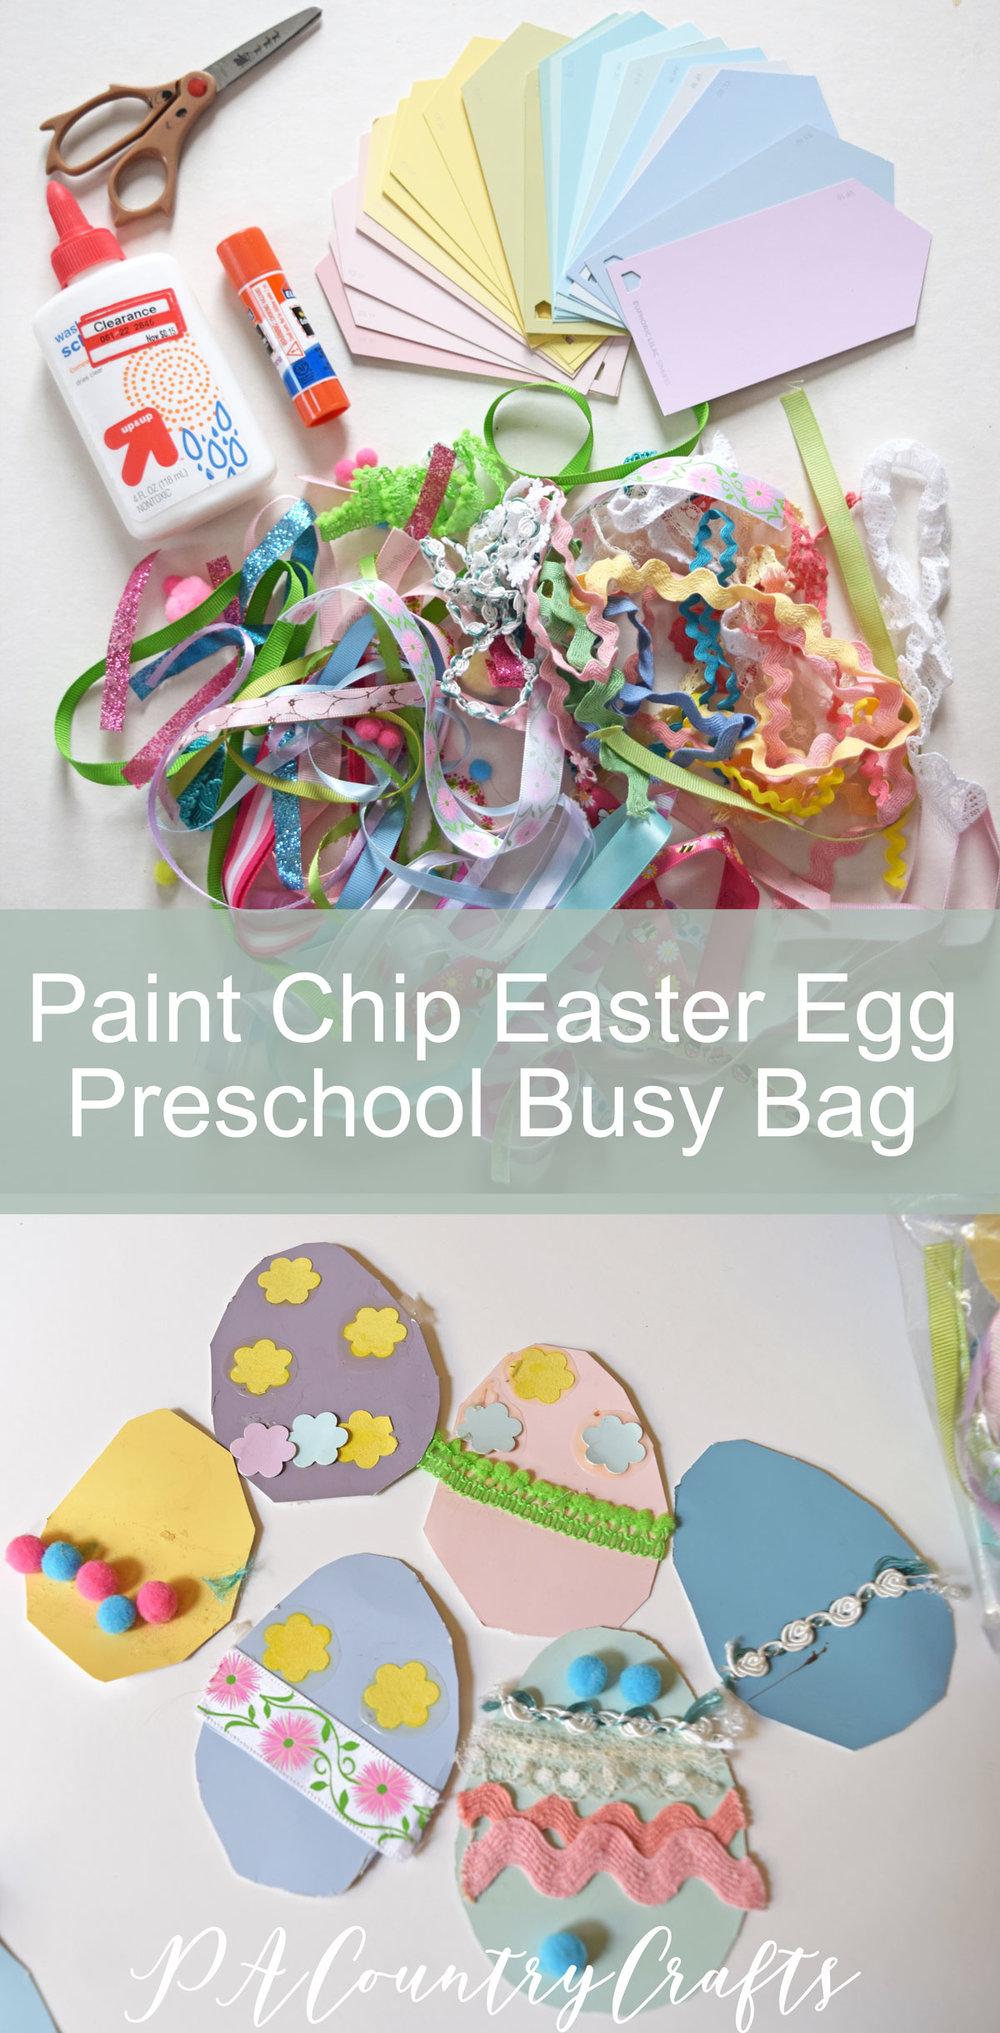 Paint Chip Easter Egg Preschool Busy Bag Craft